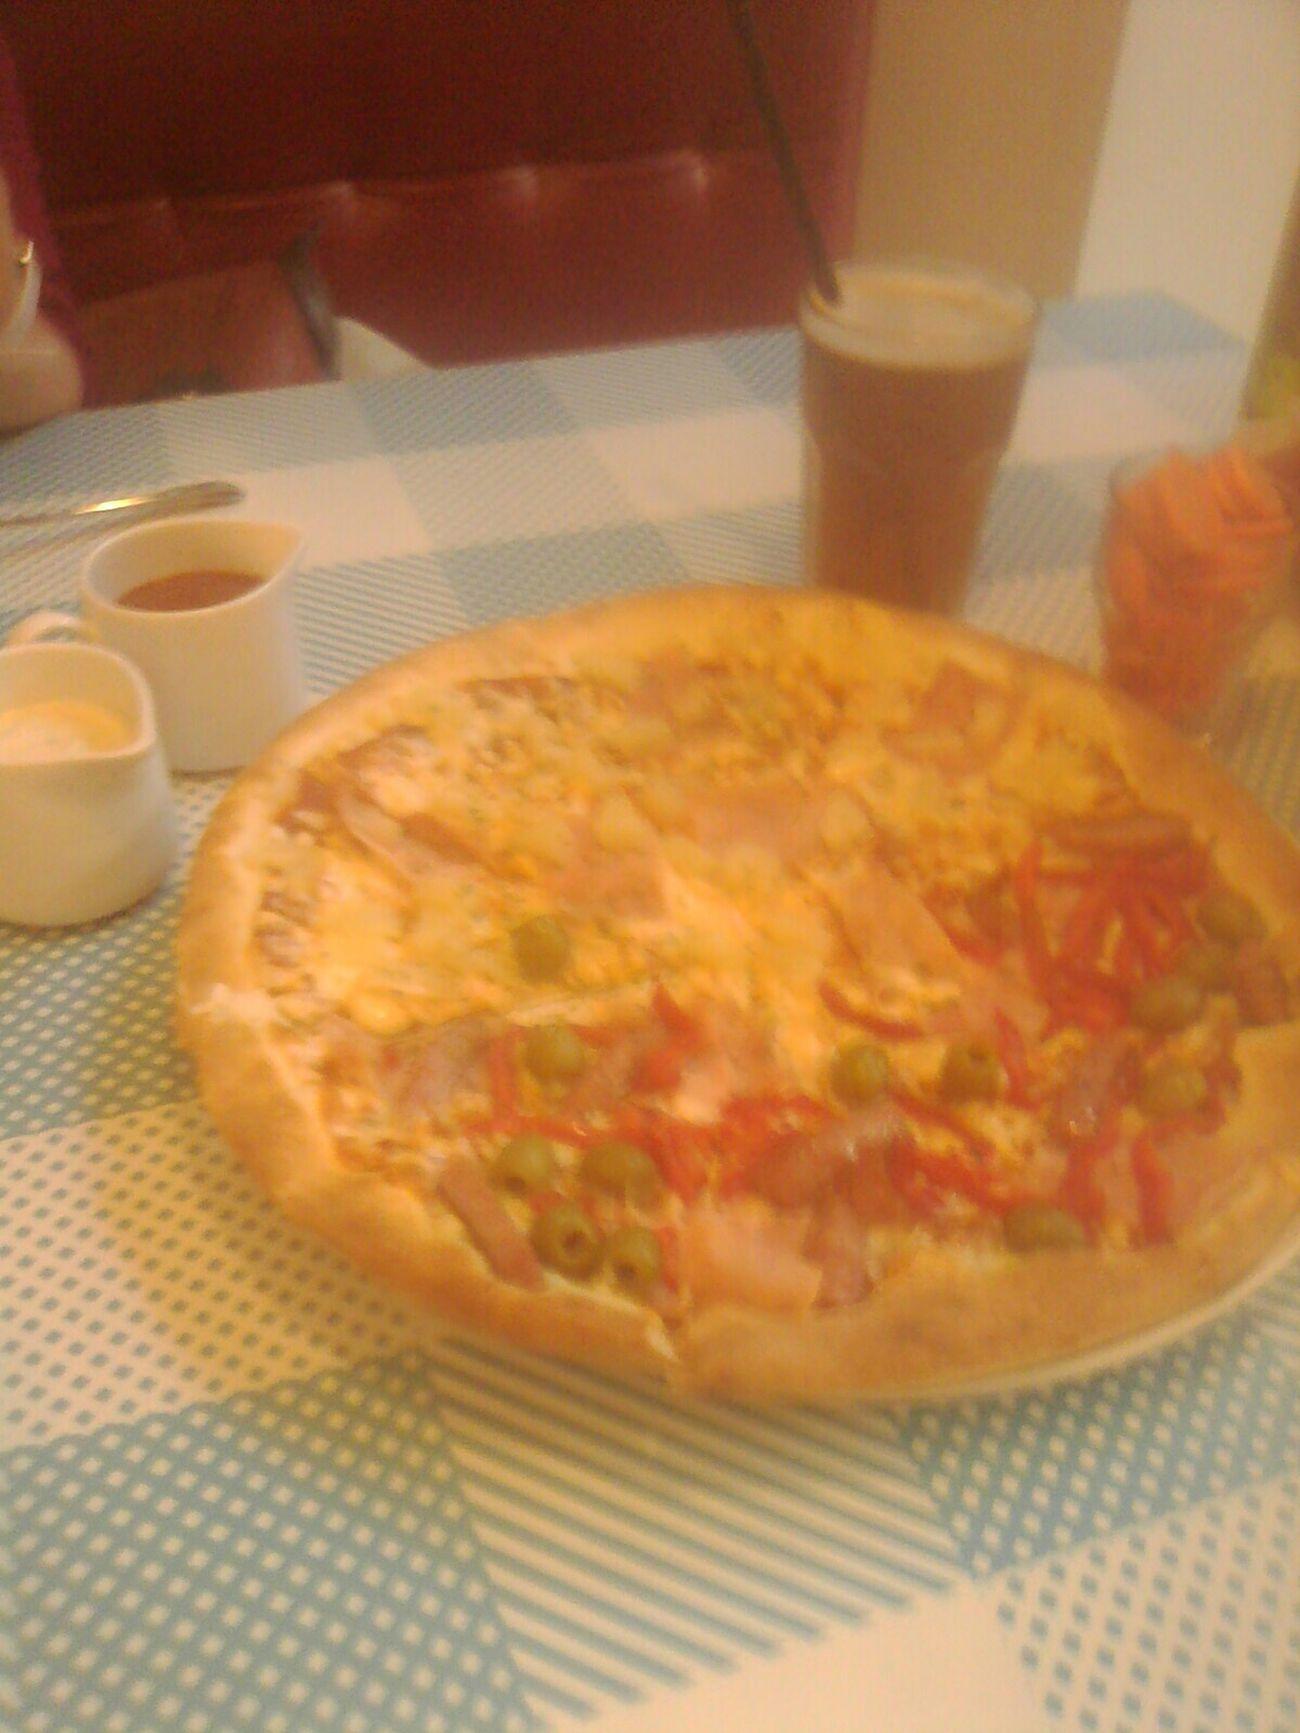 Piwo Pizza Dagrasso Lunch Time!